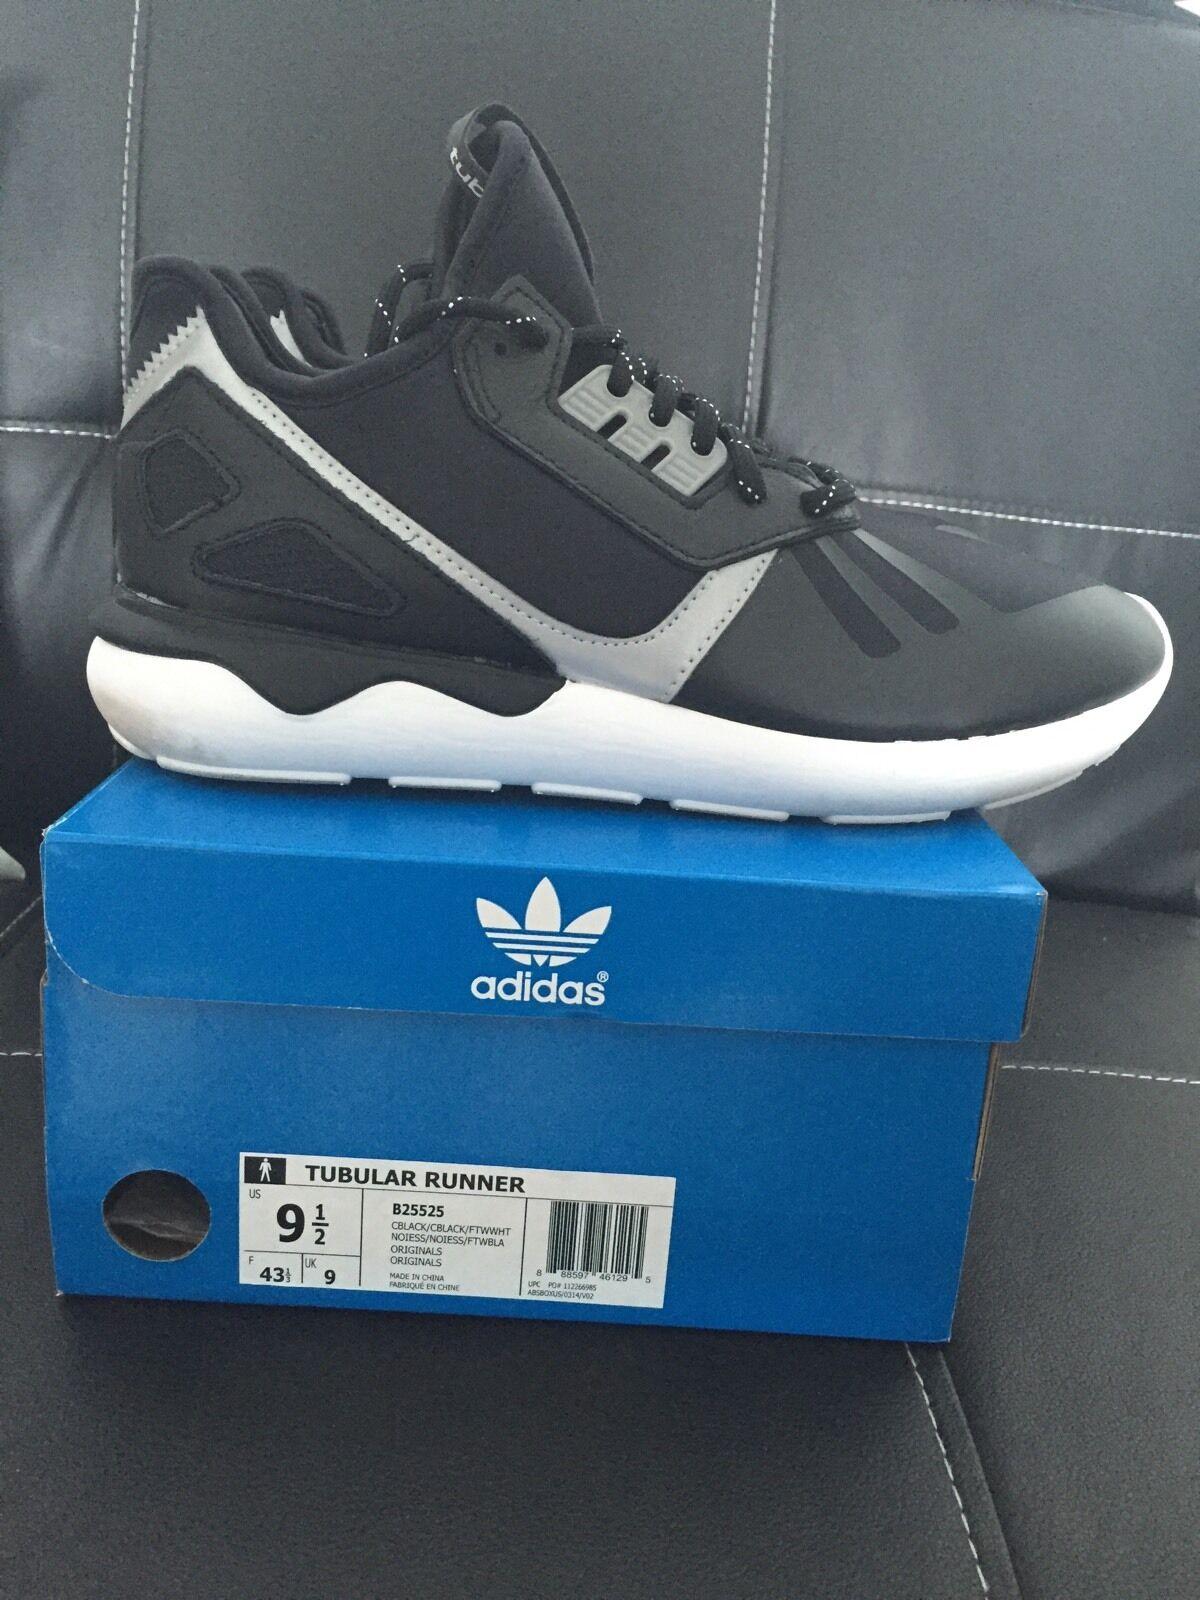 Adidas Originals Tubular Runner shoes Black White B25525 Boost